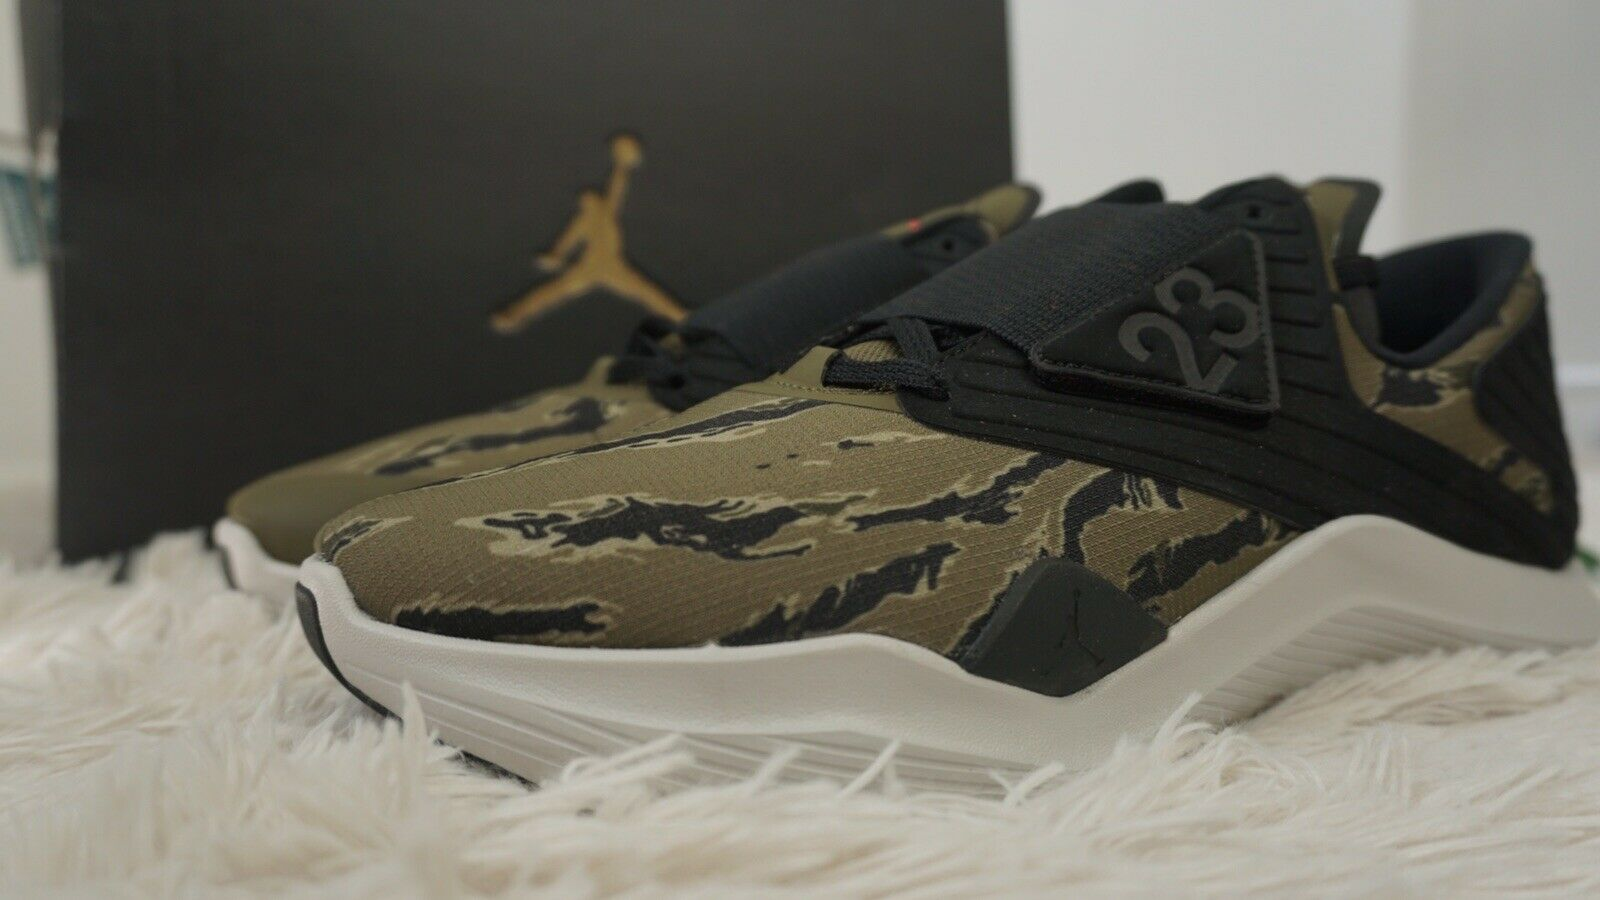 Nike Jordan Jordan Jordan relentless verde Camo Talla 10 bfb842